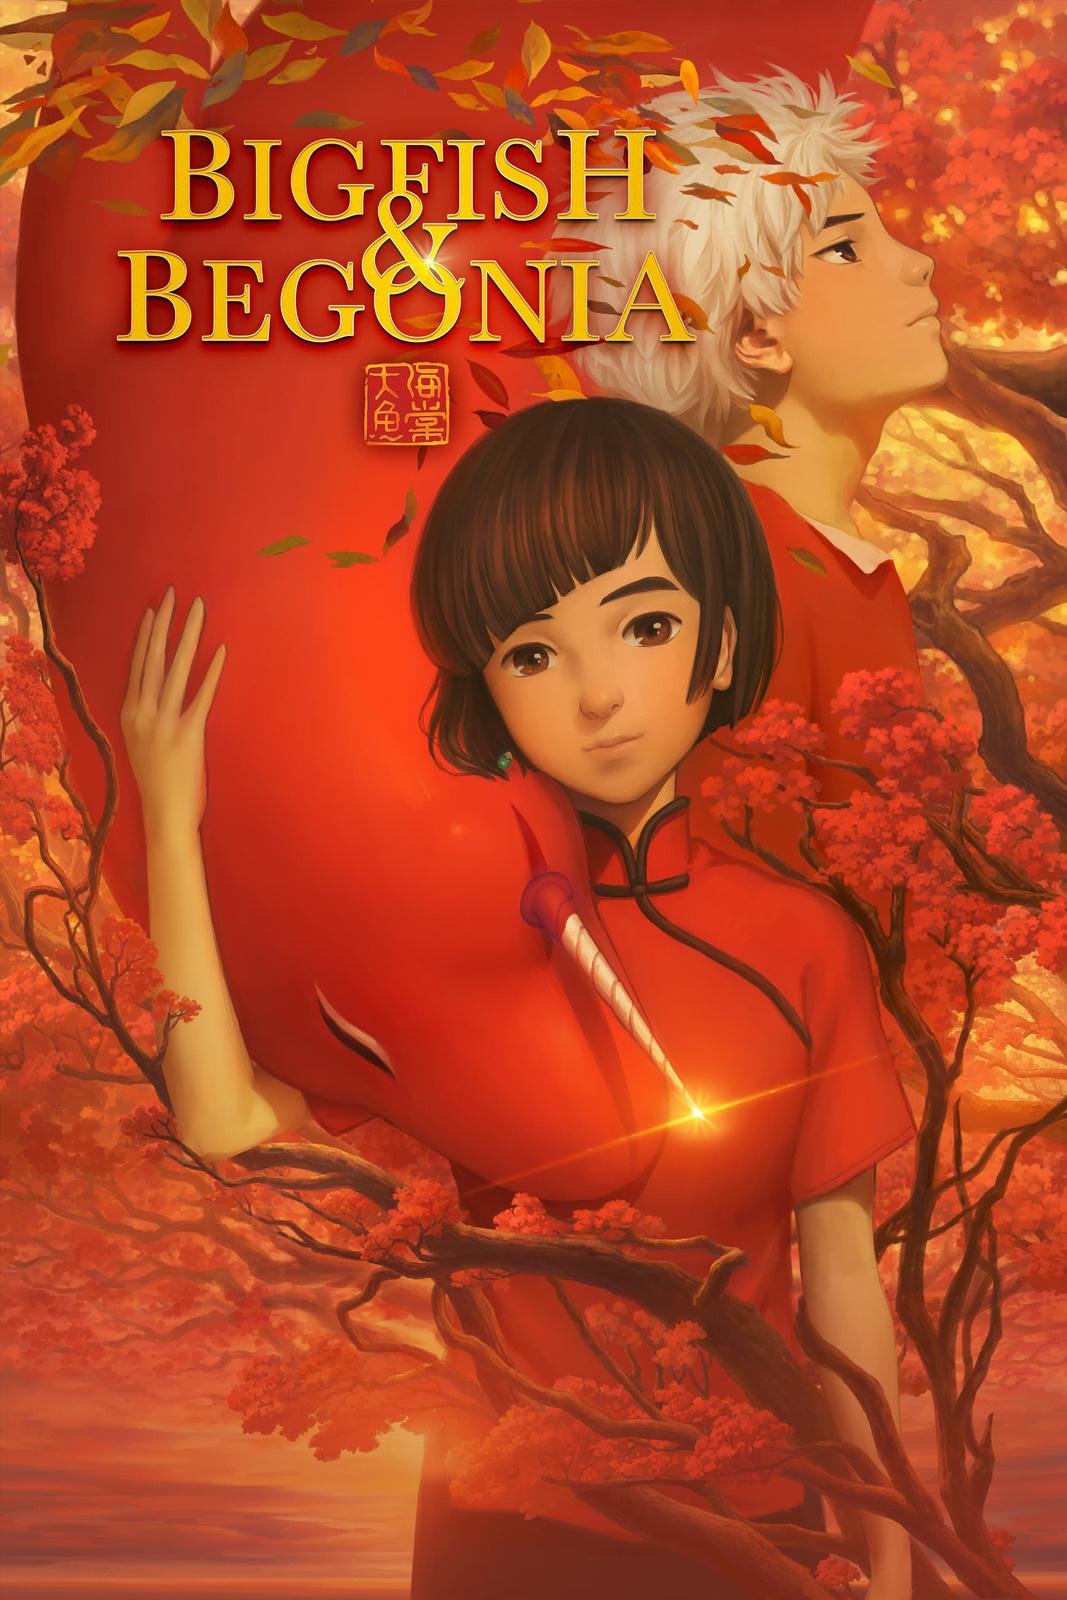 Big Fish & Begonia - Resenha - Poster